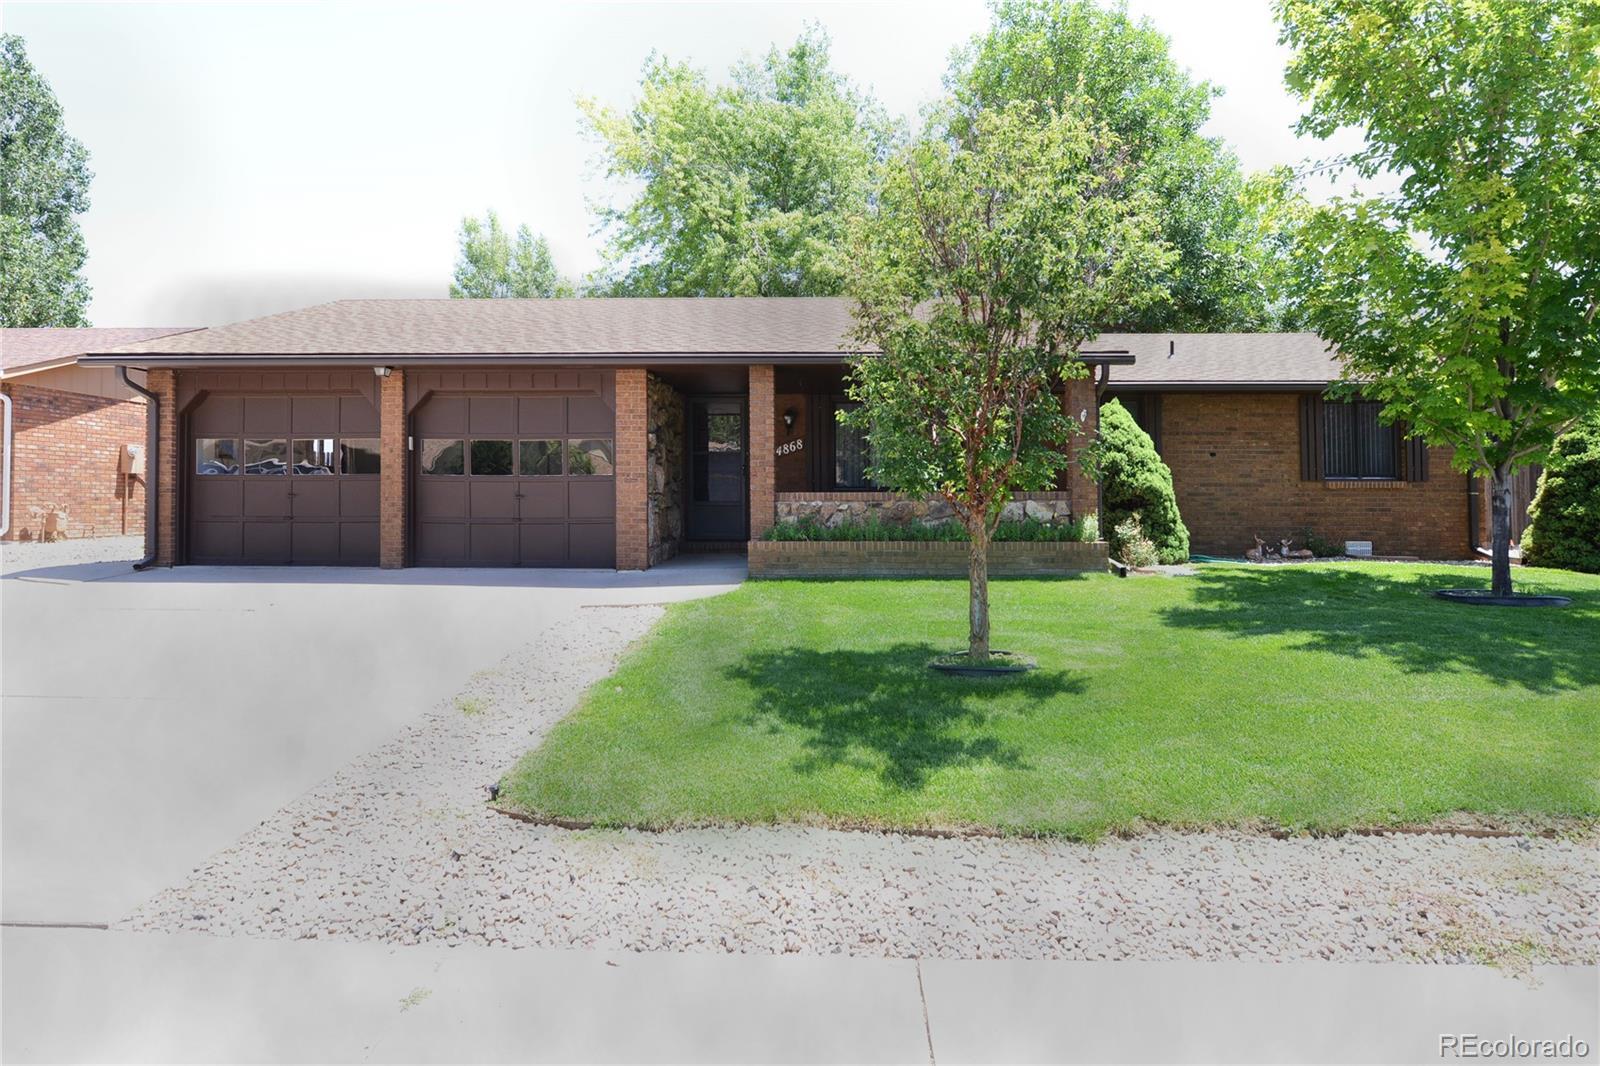 4868 Sheridan Property Photo - Loveland, CO real estate listing